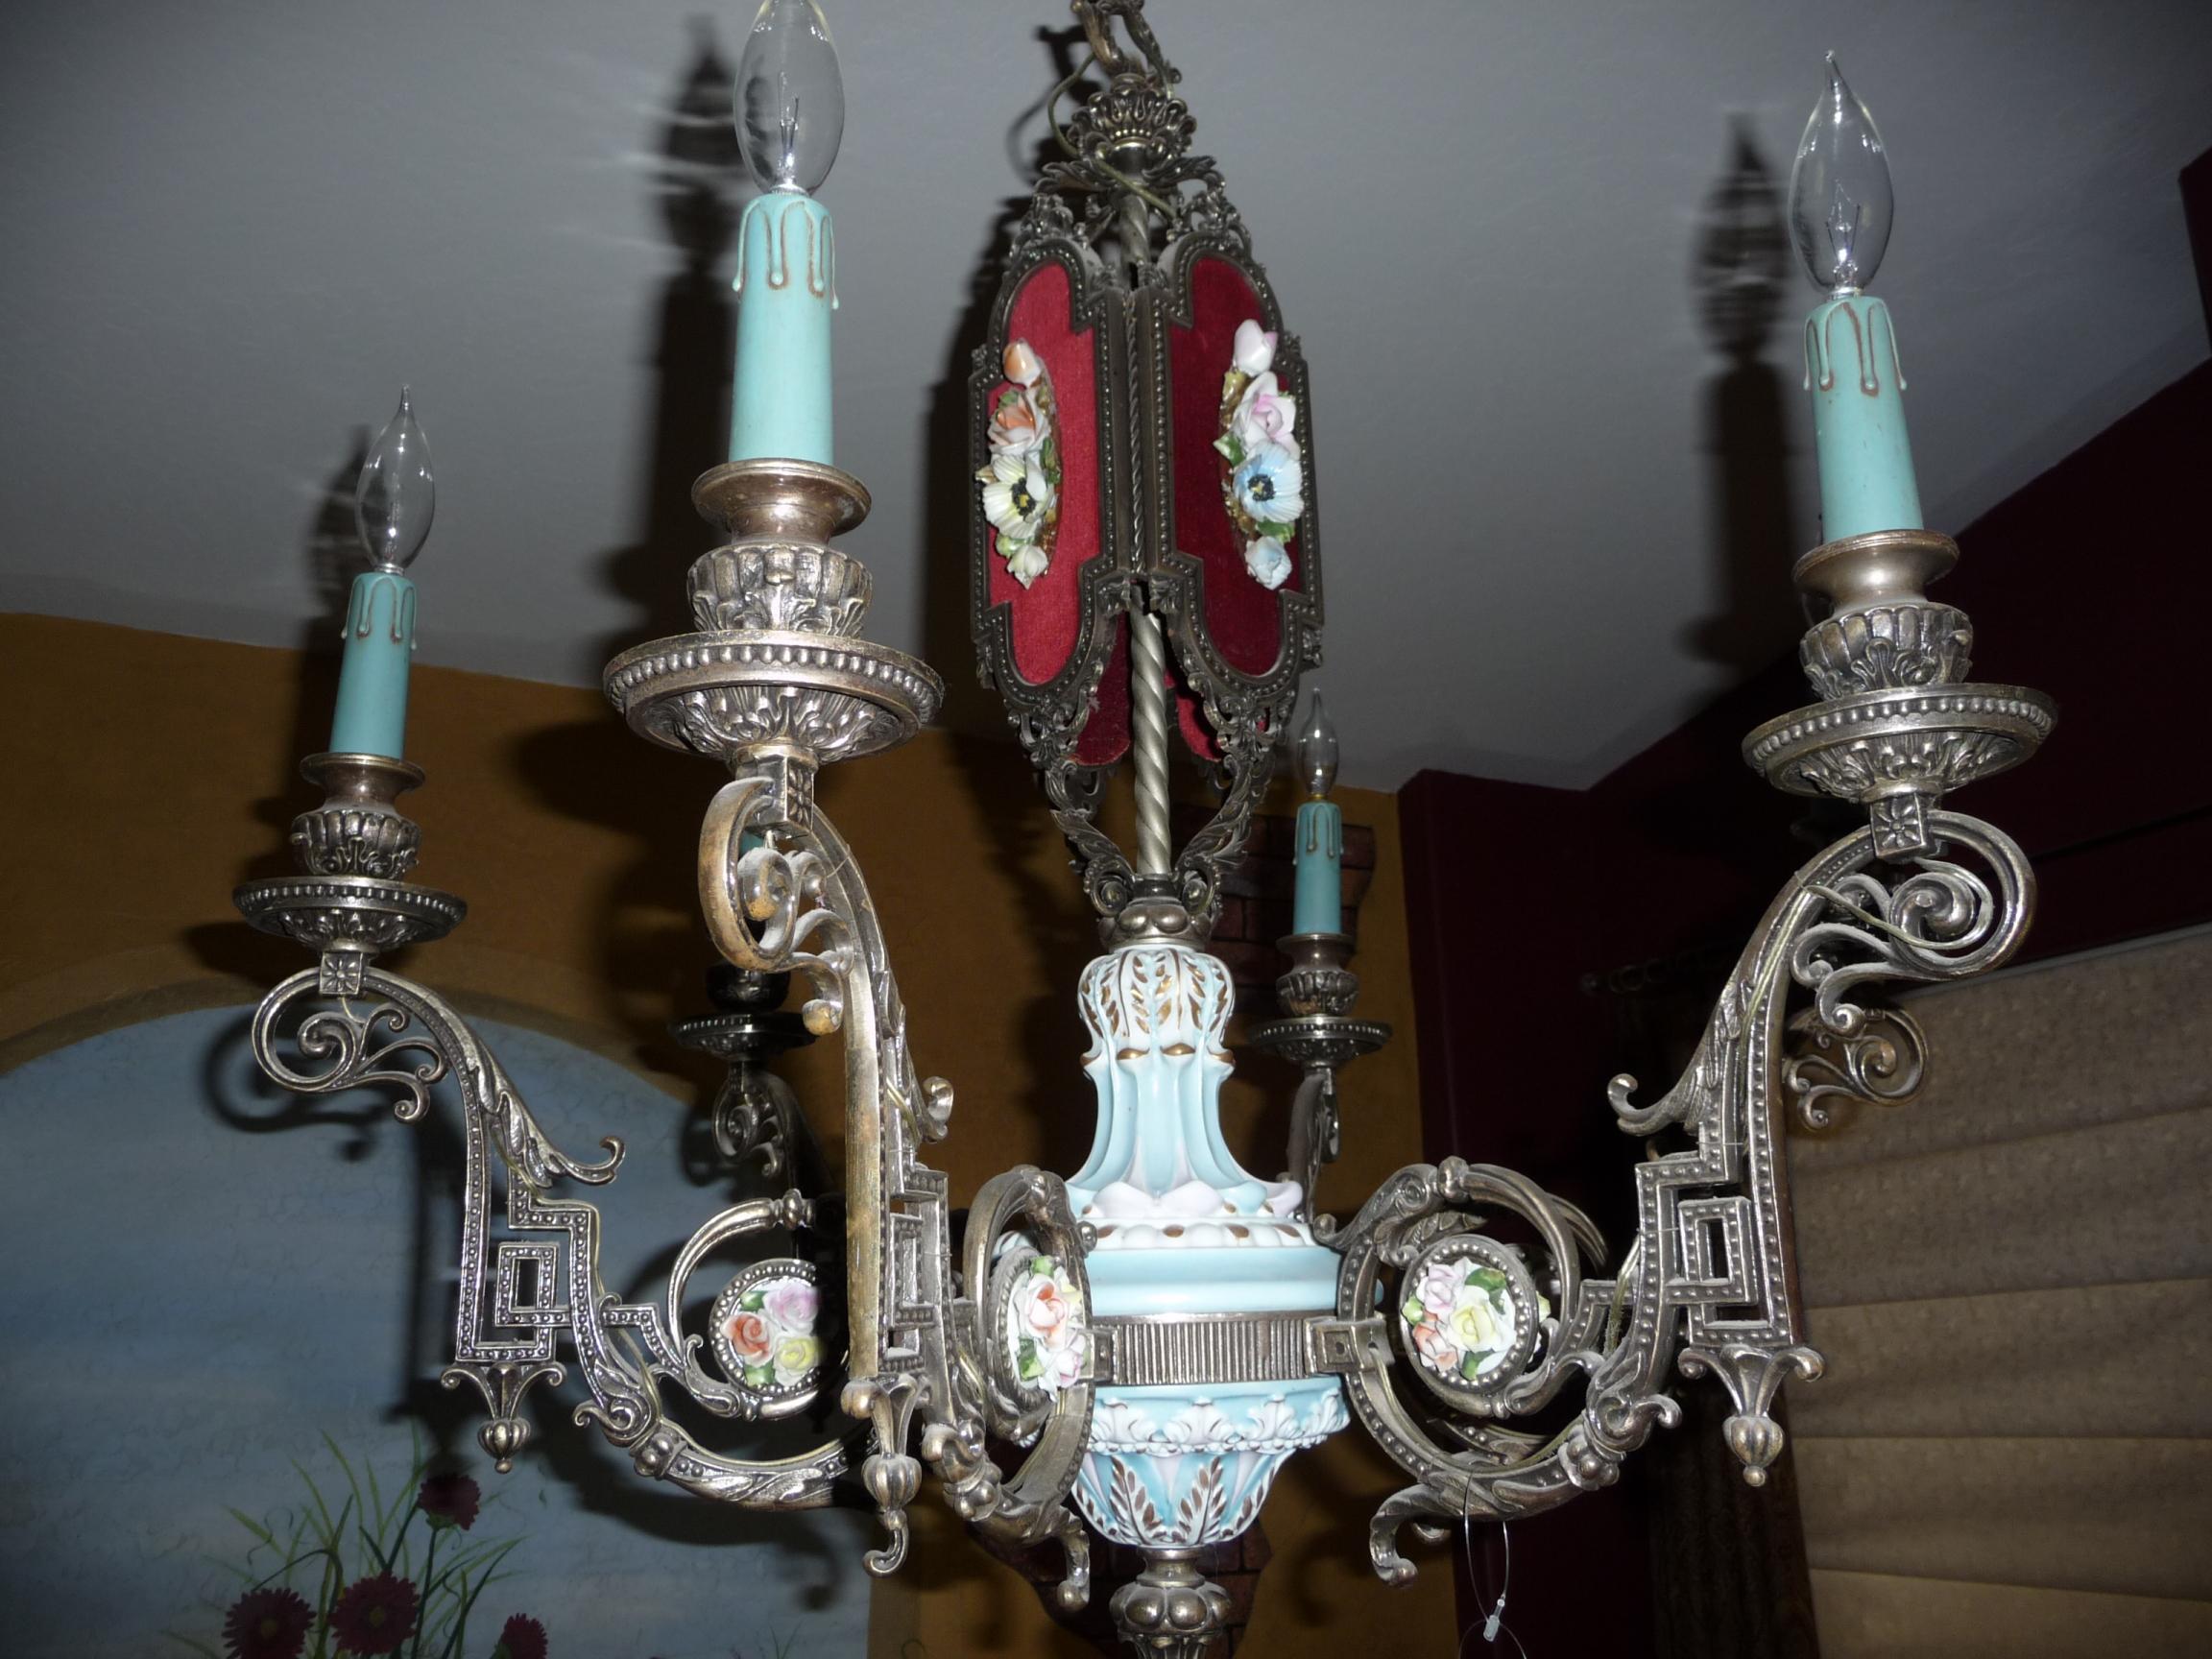 VINTAGE ITALIAN CAPODIMONTE CHANDELIER 1950 s antique appraisal